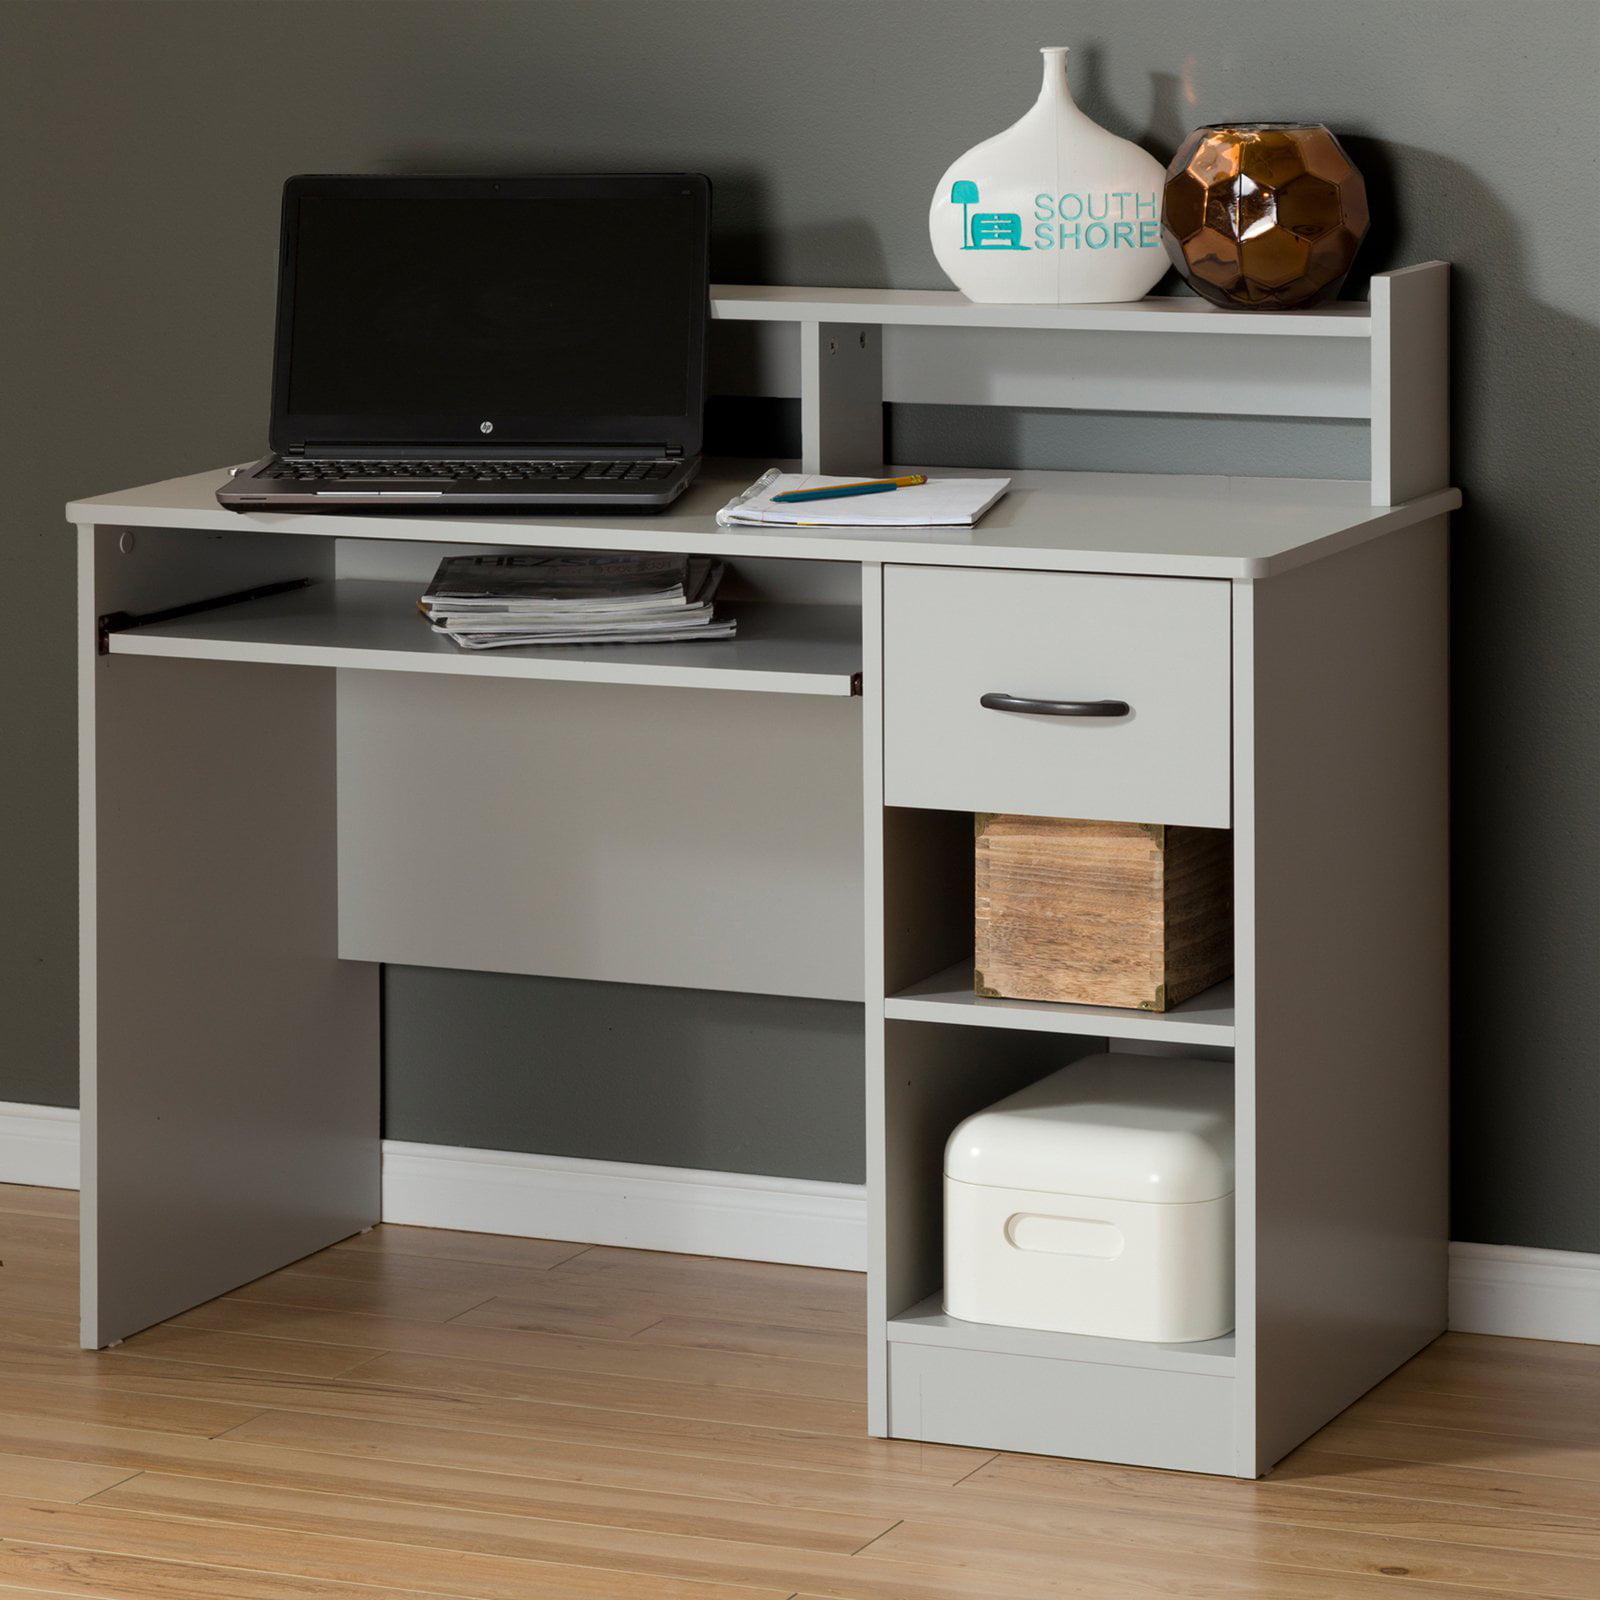 South Shore Smart Basics Small Desk, Multiple Finishes   Walmart.com